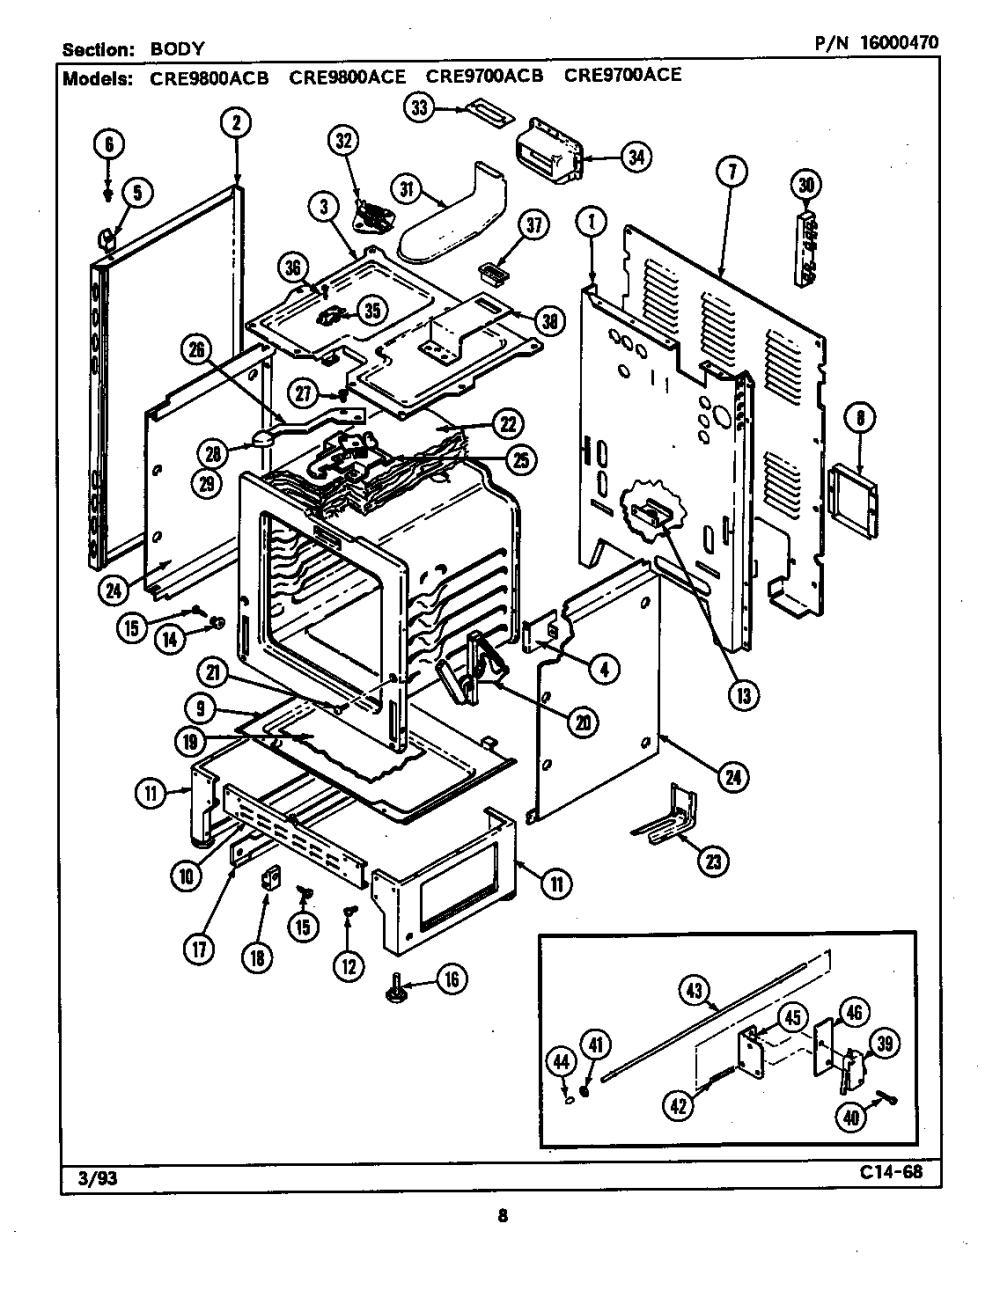 medium resolution of traulsen wiring diagrams electrical covuk rep mannheim de u2022traulsen wiring diagrams best wiring library rh